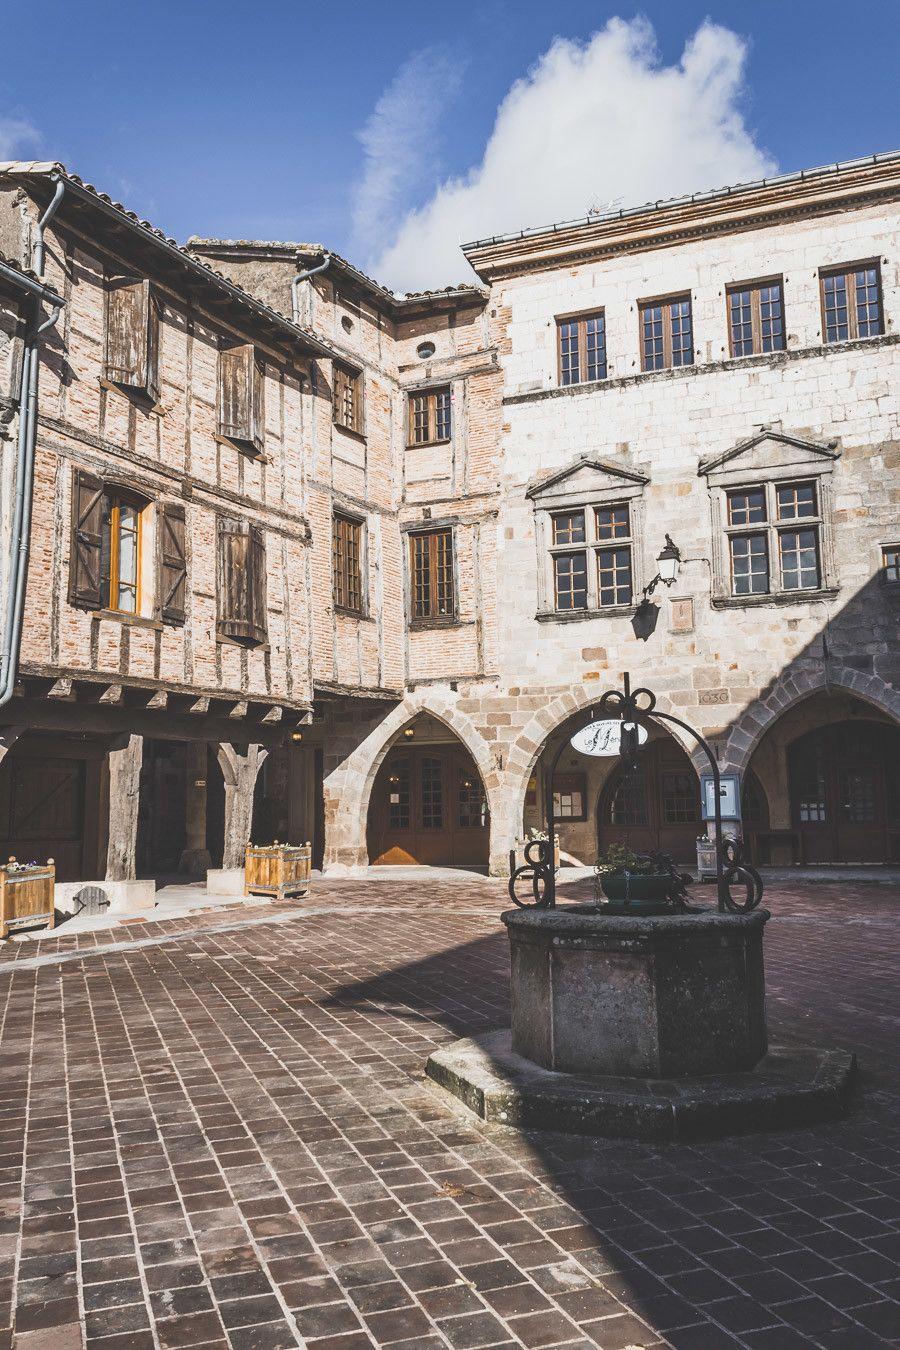 Visiter le Tarn, Occitanie, France